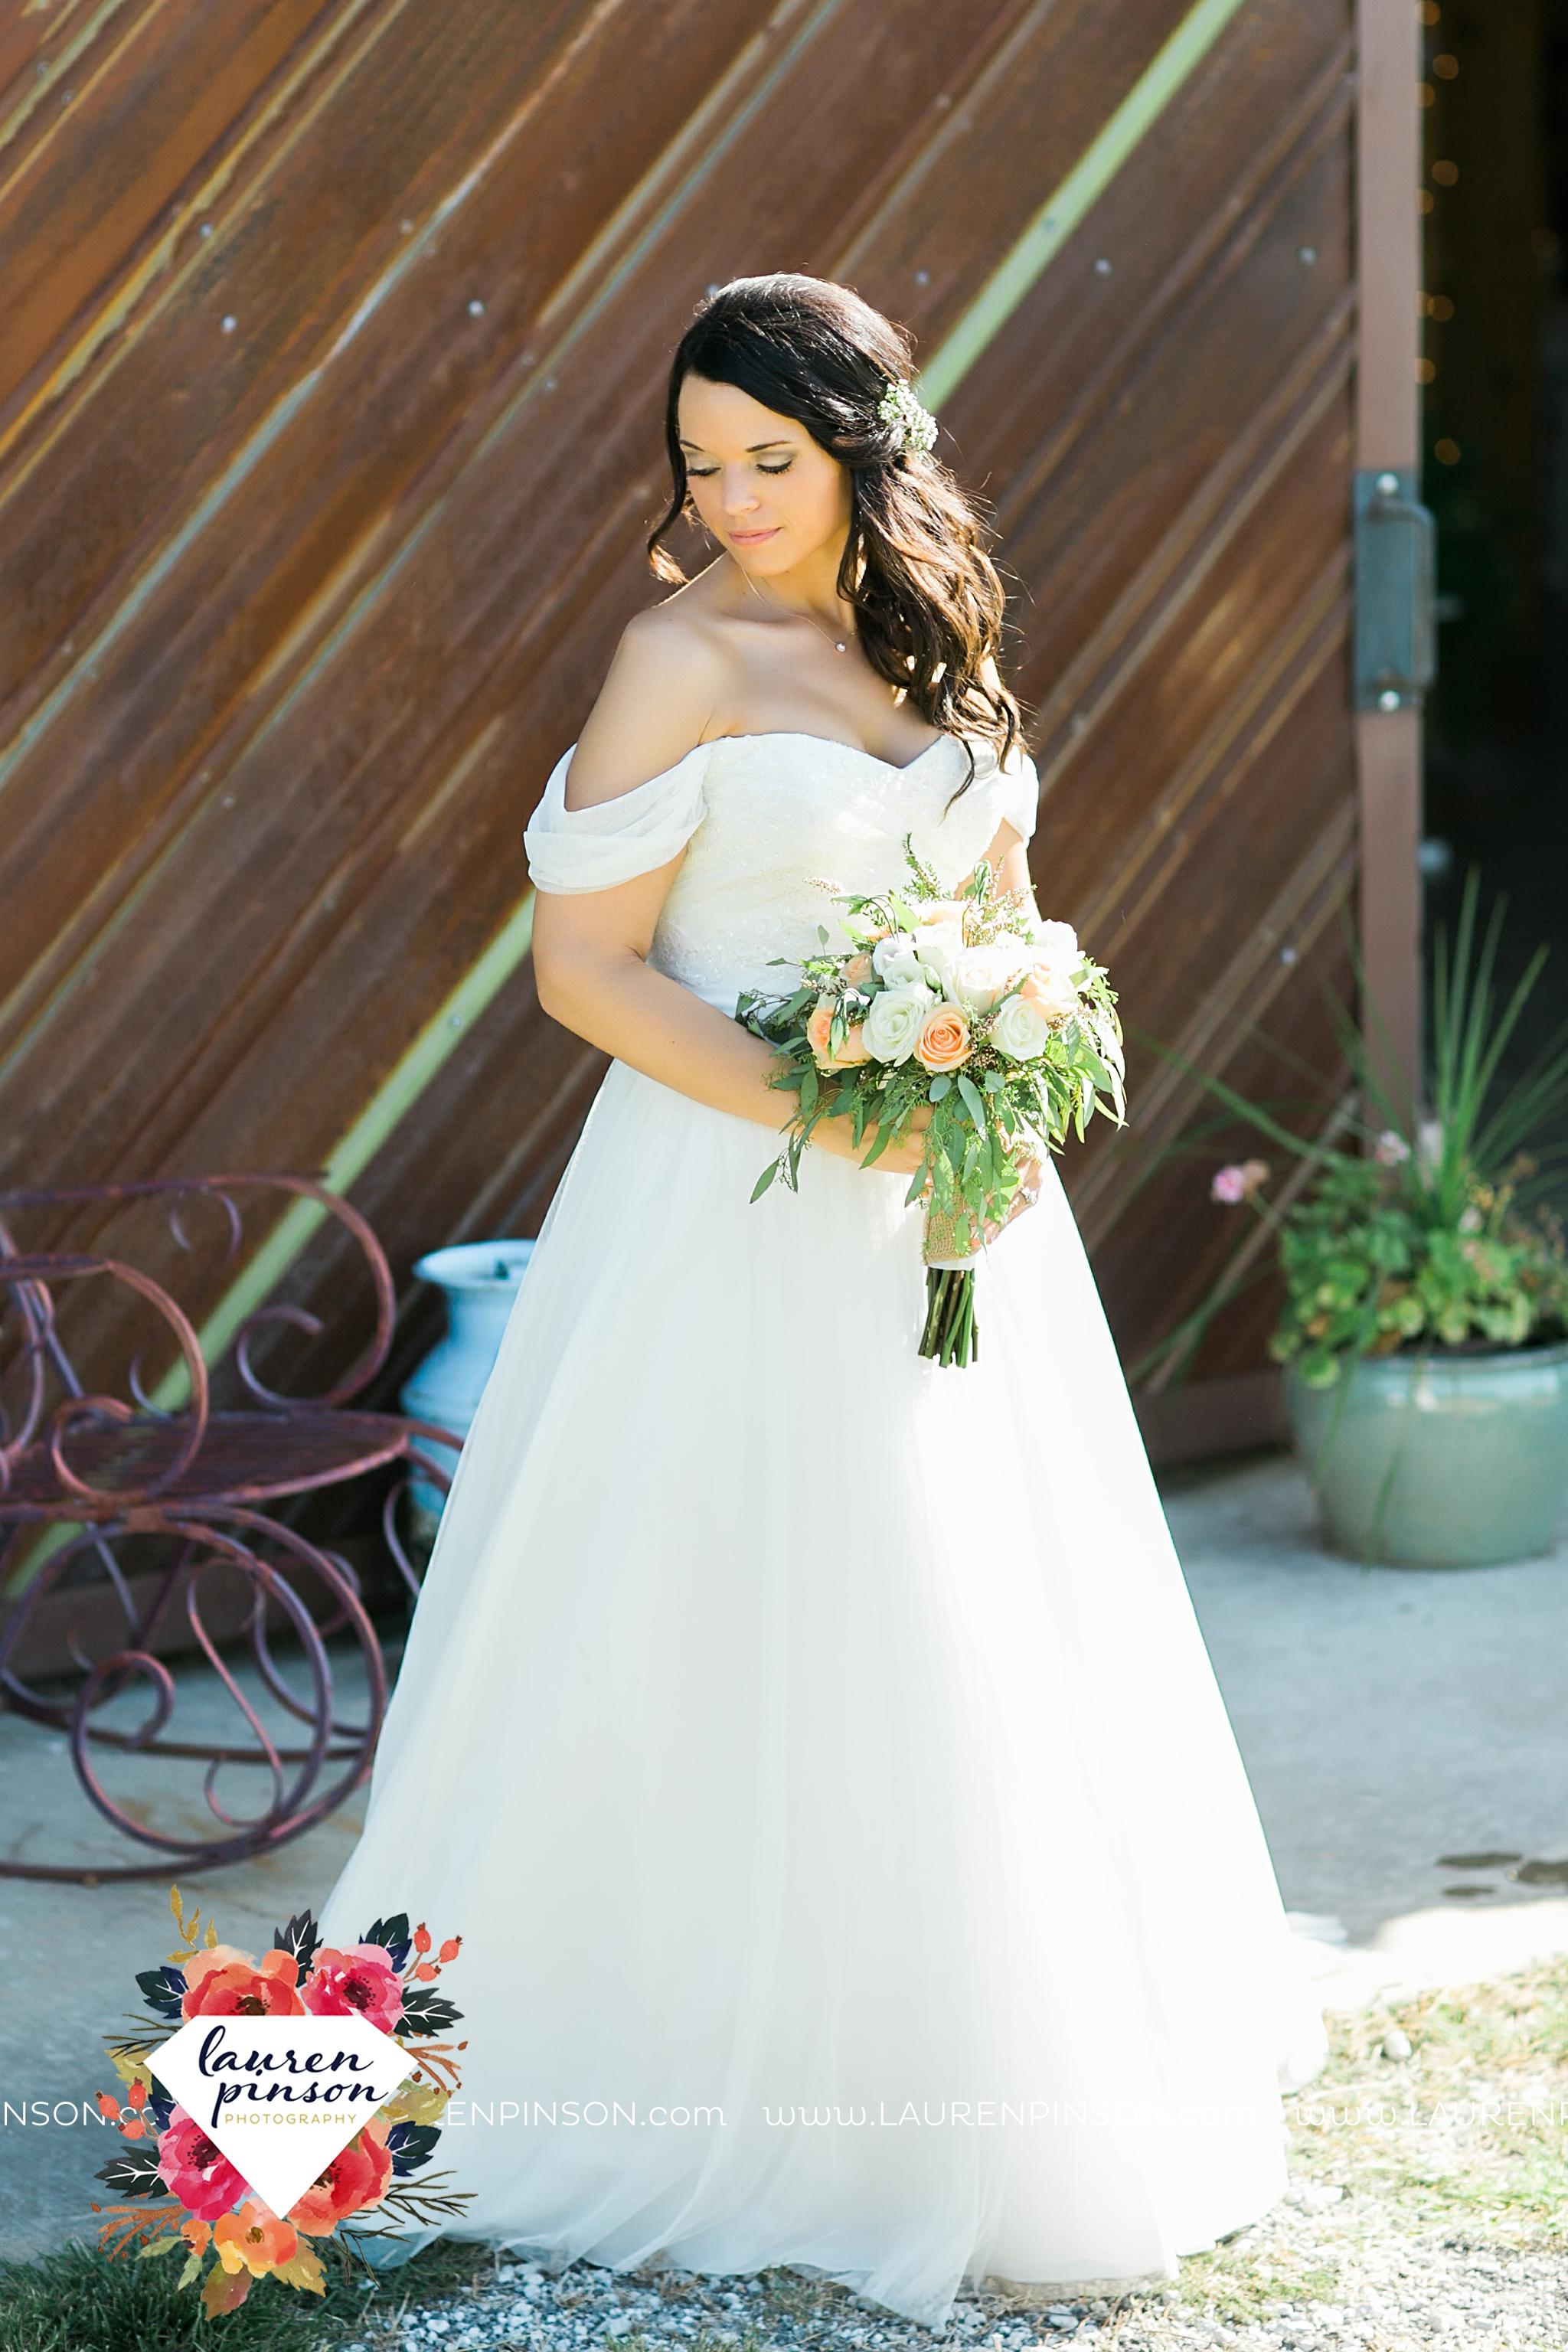 jones-barn-willow-creek-ranch-wedding-in-cleburne-texas-fort-worth-dfw-wichita-falls-wedding-photography_3231.jpg